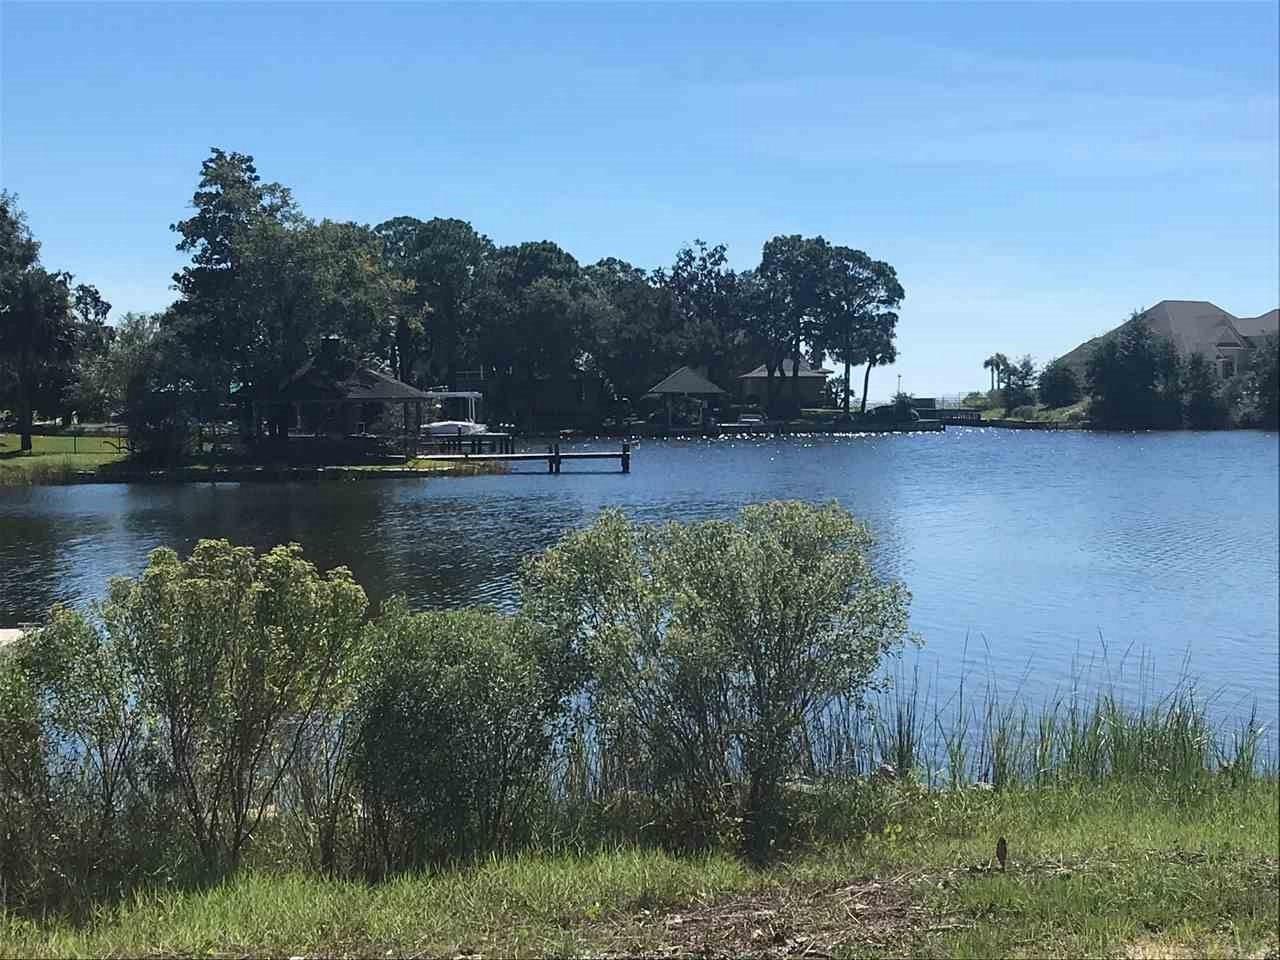 74 Star Lake Dr, Pensacola, FL 32507